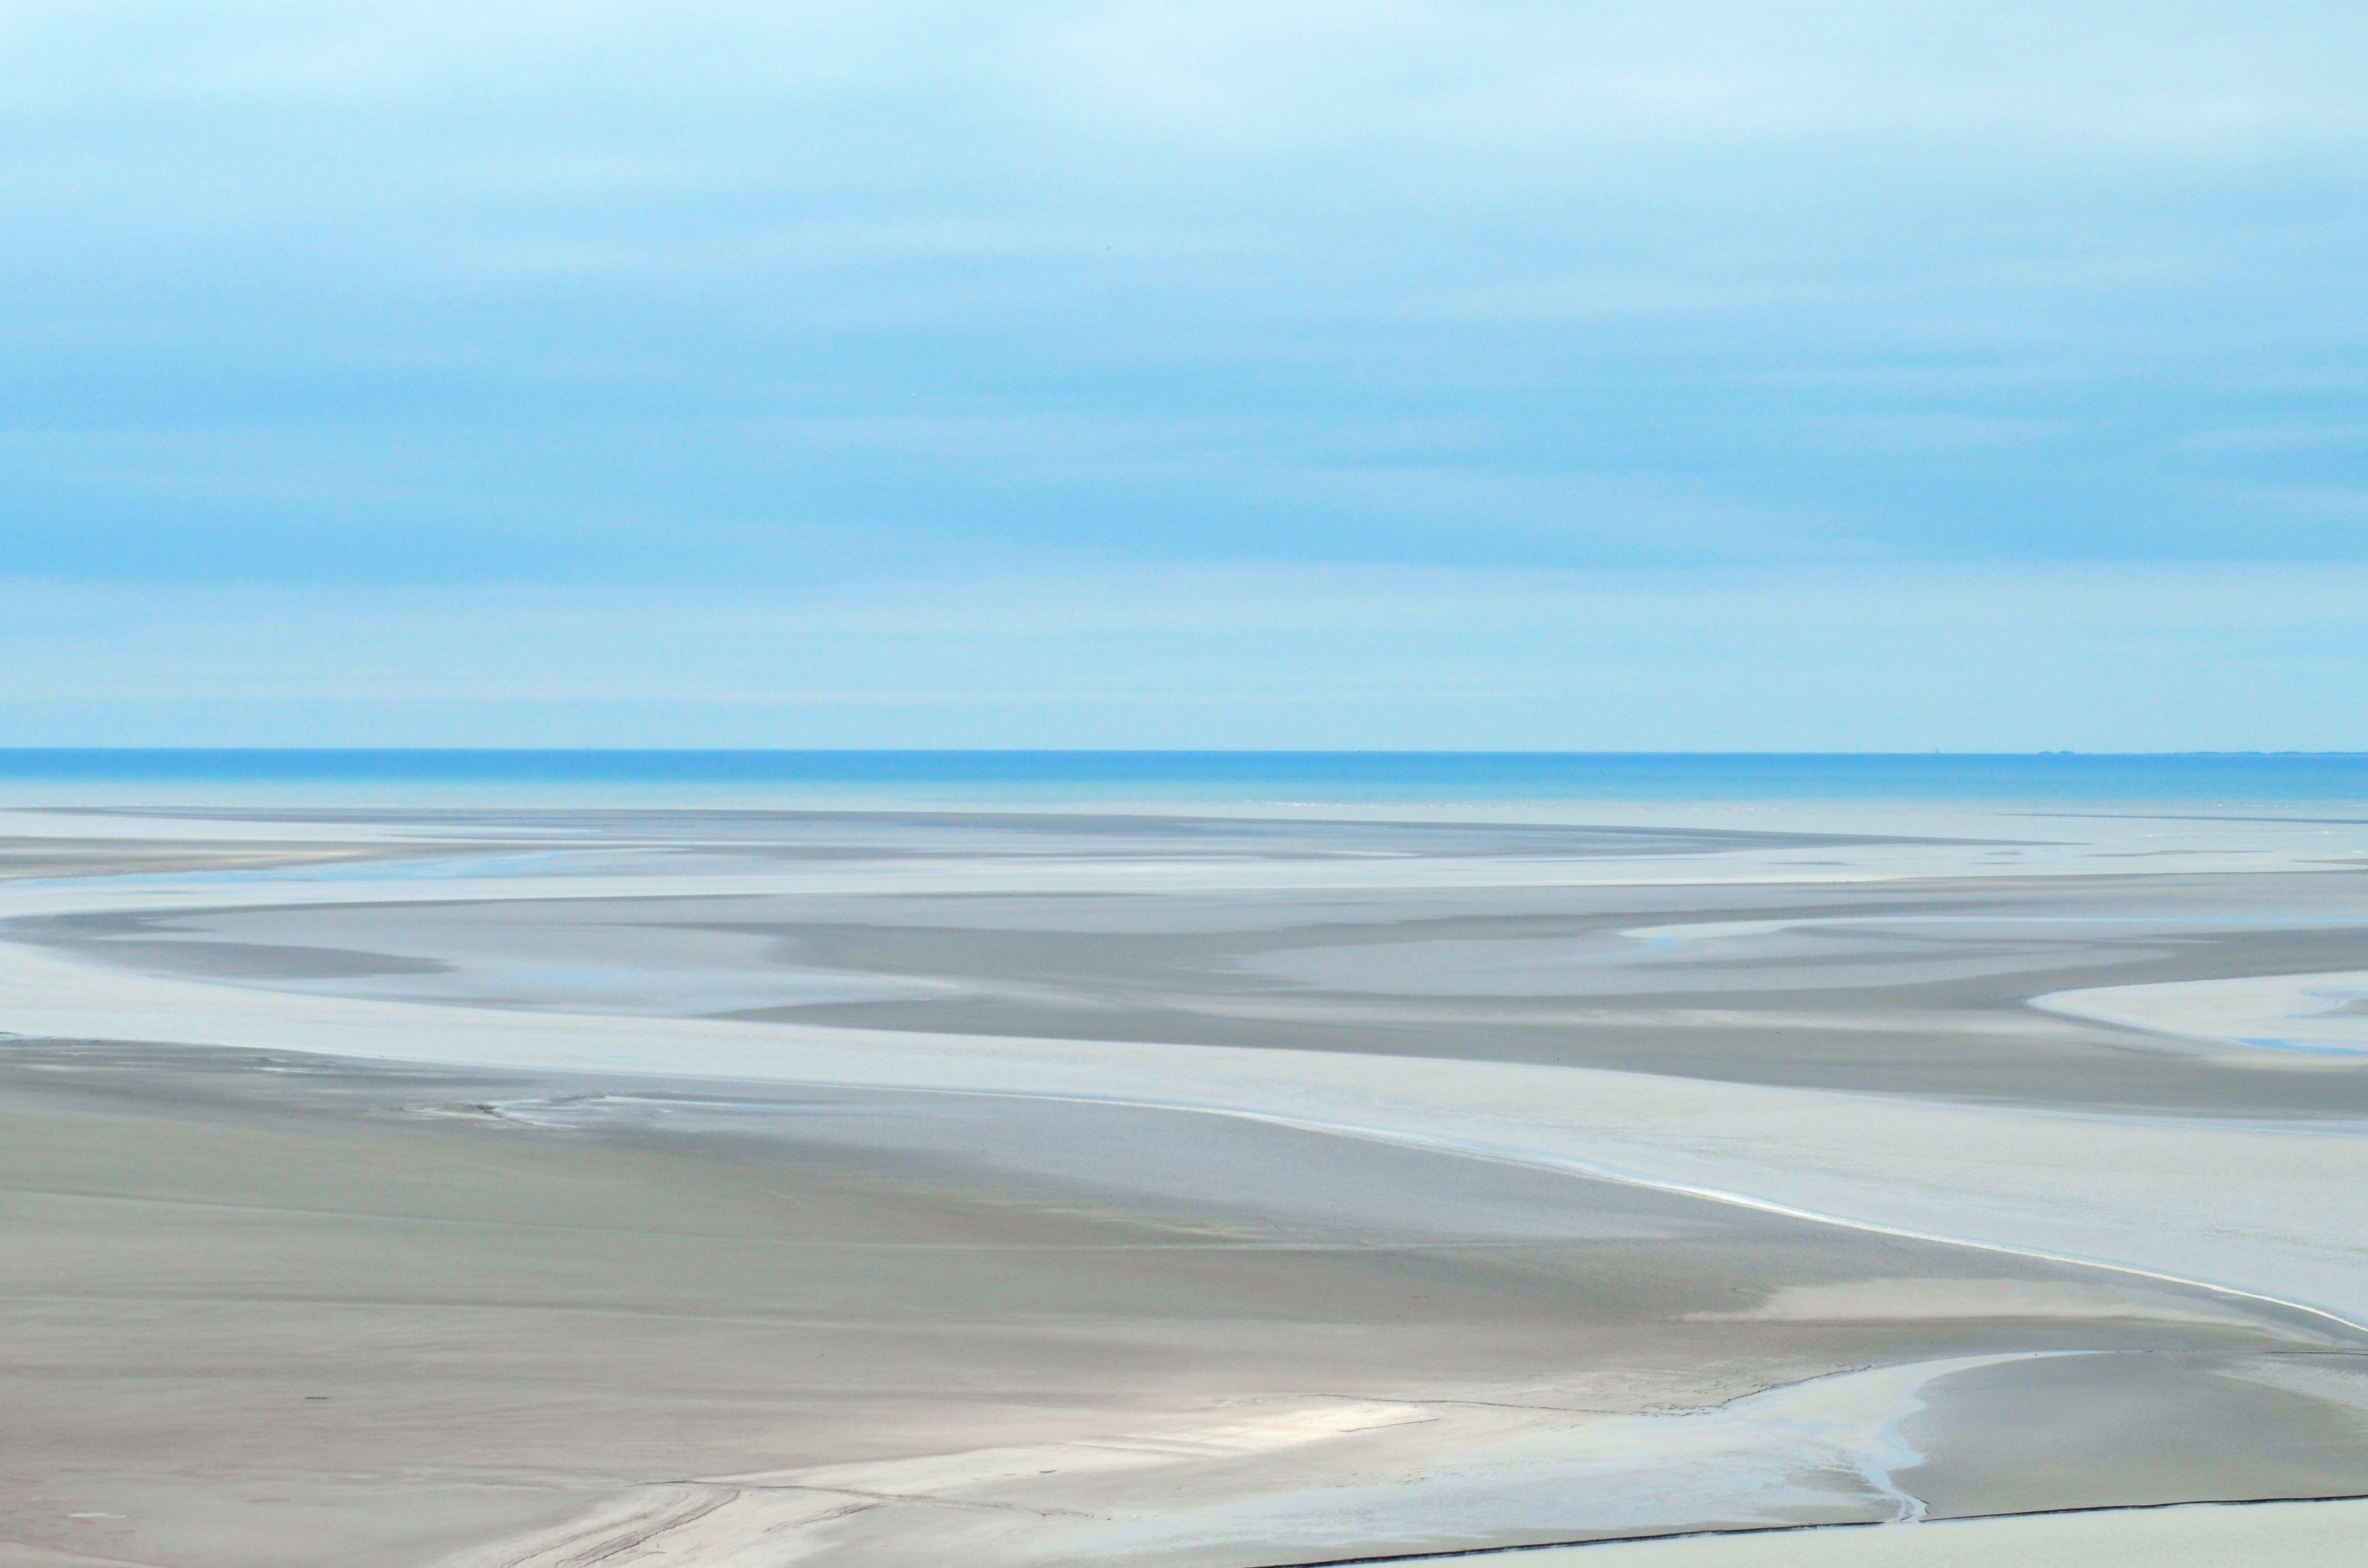 Gray Sand Dunes Under Blue Sky